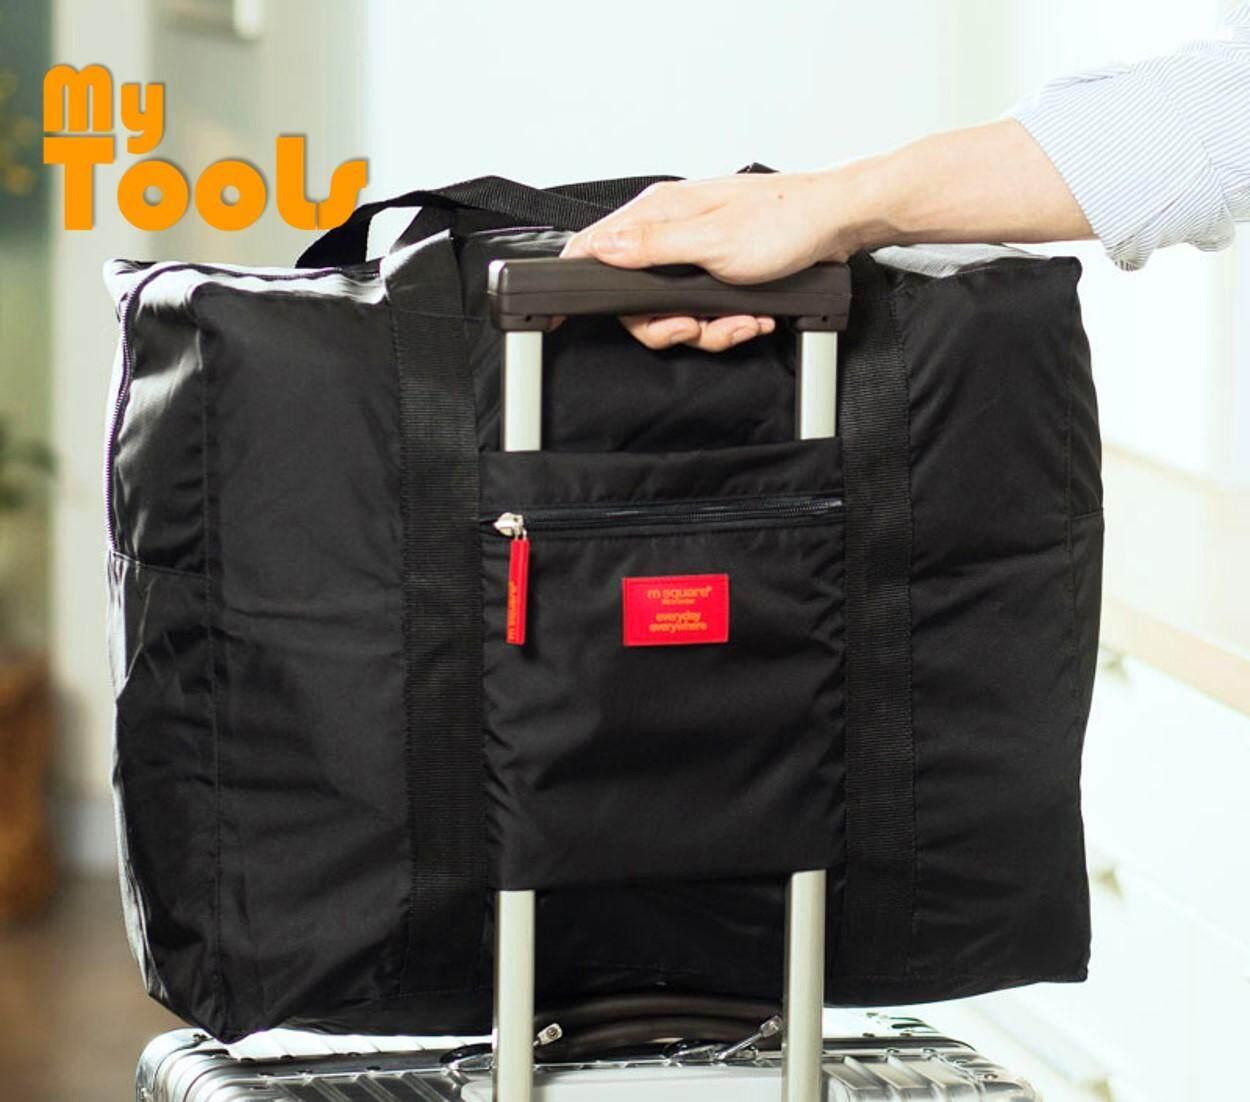 Mytools 32l Korea Foldable Waterproof Lightweight Nylon Travel Luggage Duffel Bag By Mytools Marketing.